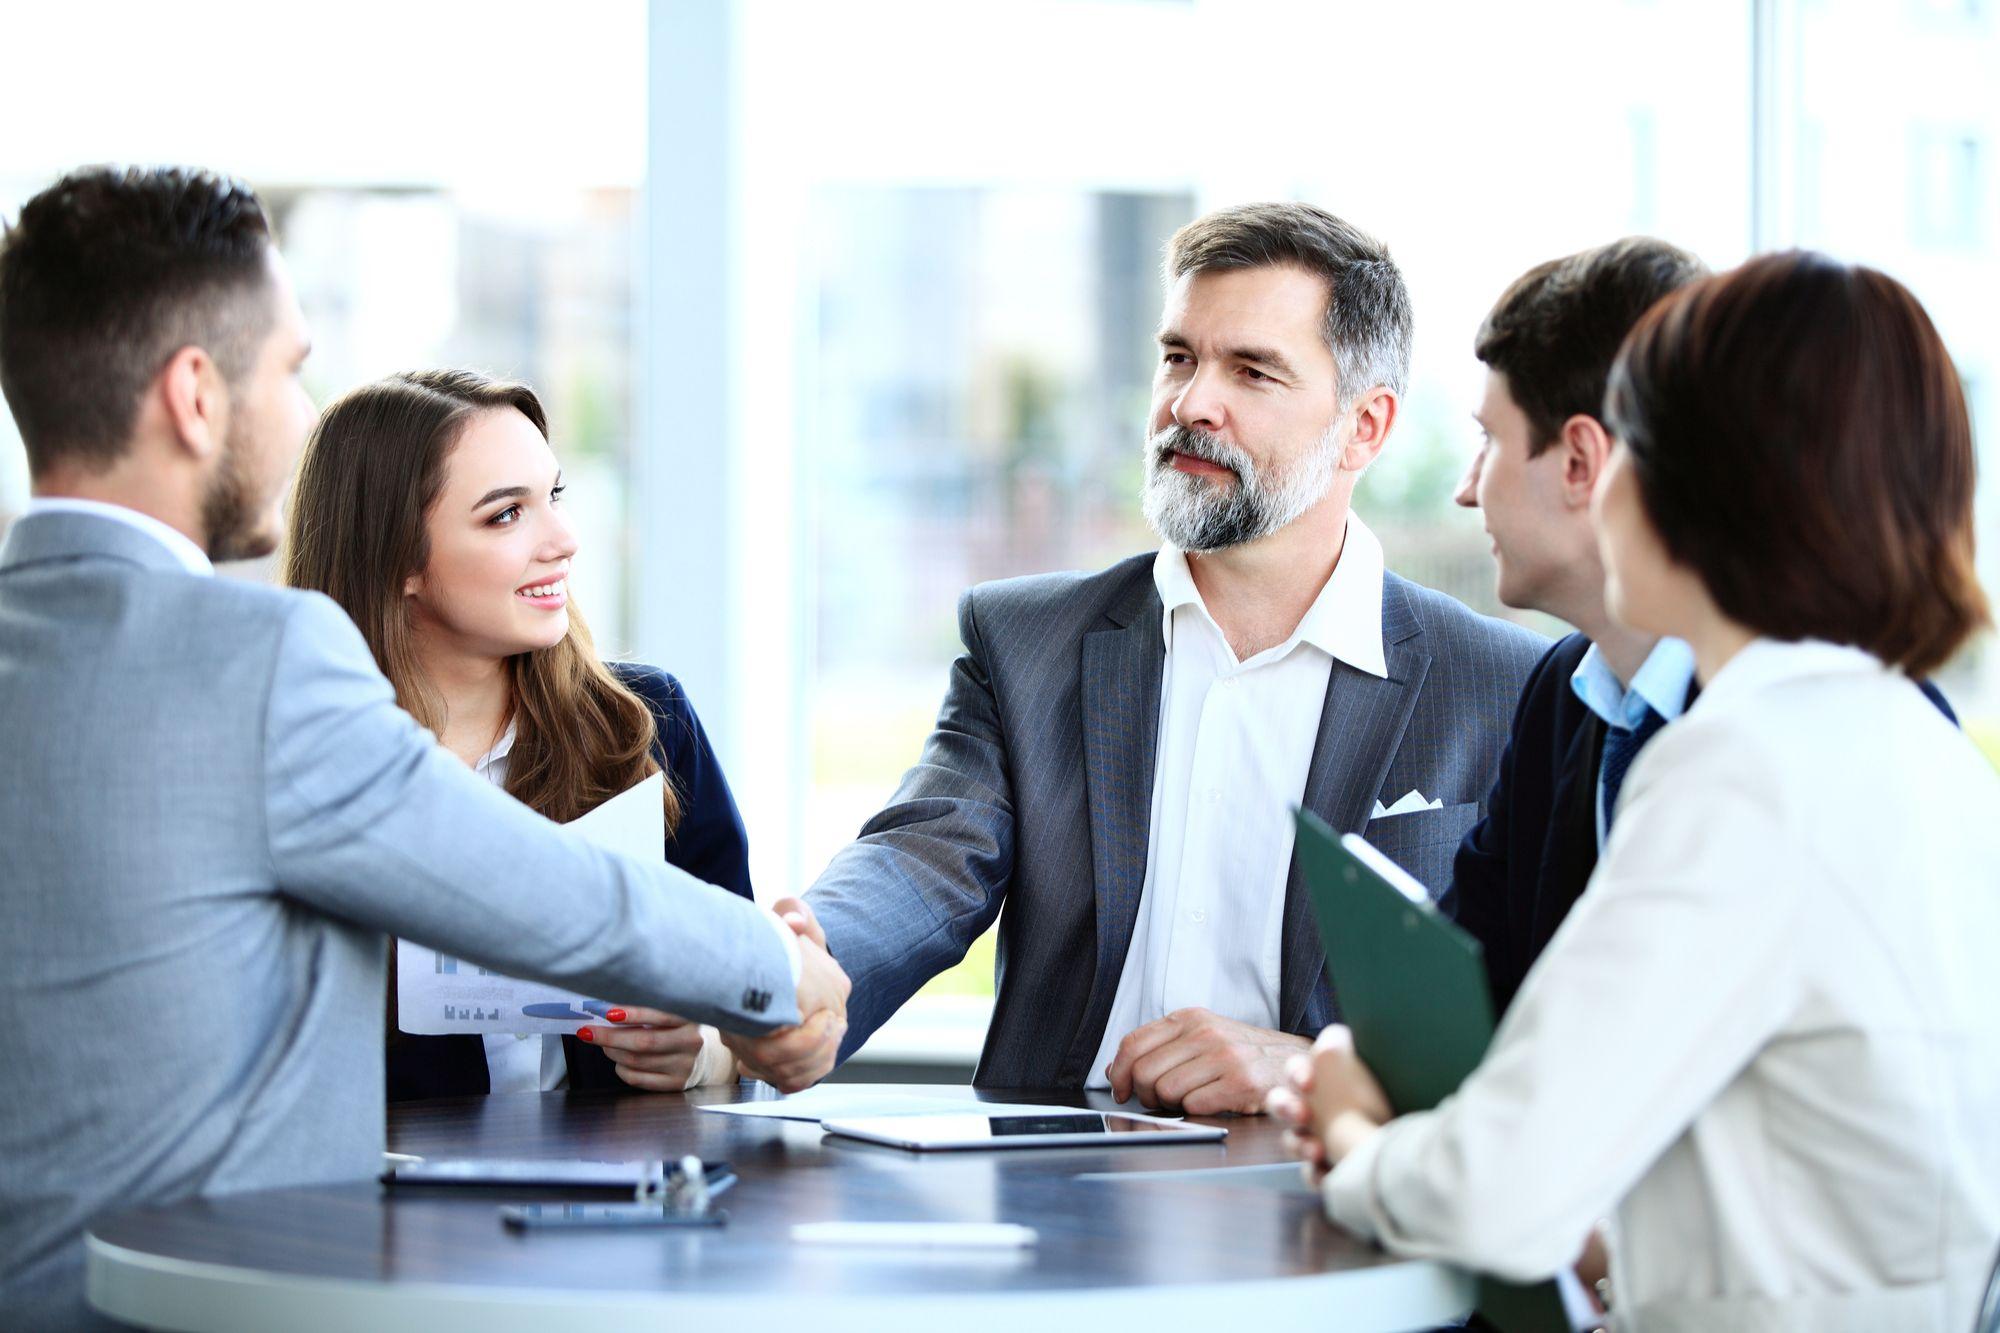 quy trình bán hàng, quy trình bán hàng chuyên nghiệp, xây dựng quy trình bán hàng, quy trình bán hàng chuẩn